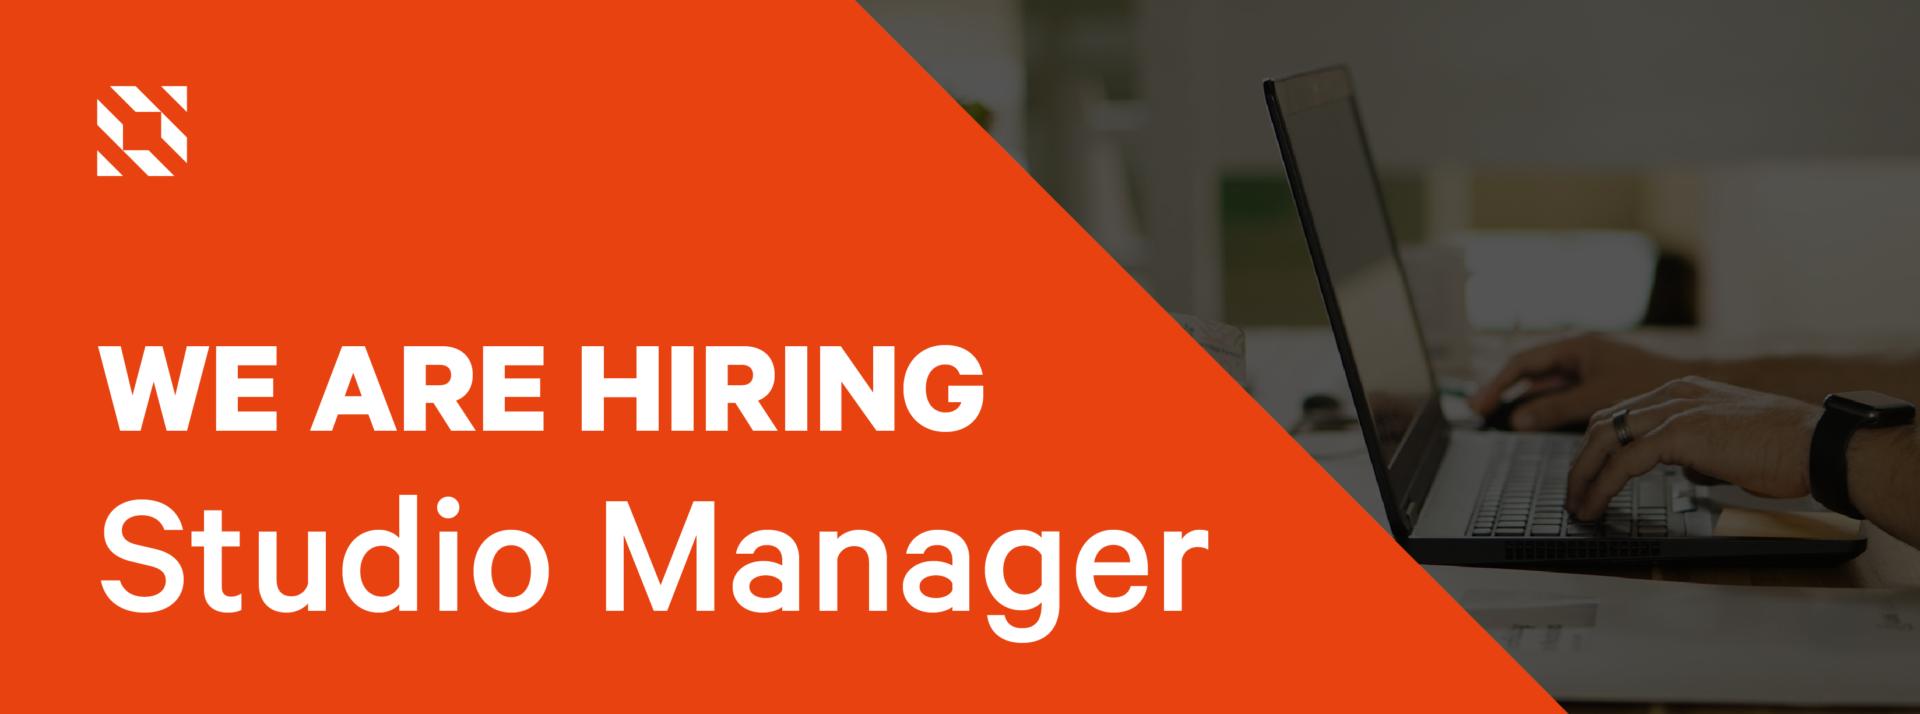 We're hiring - Studio Manager